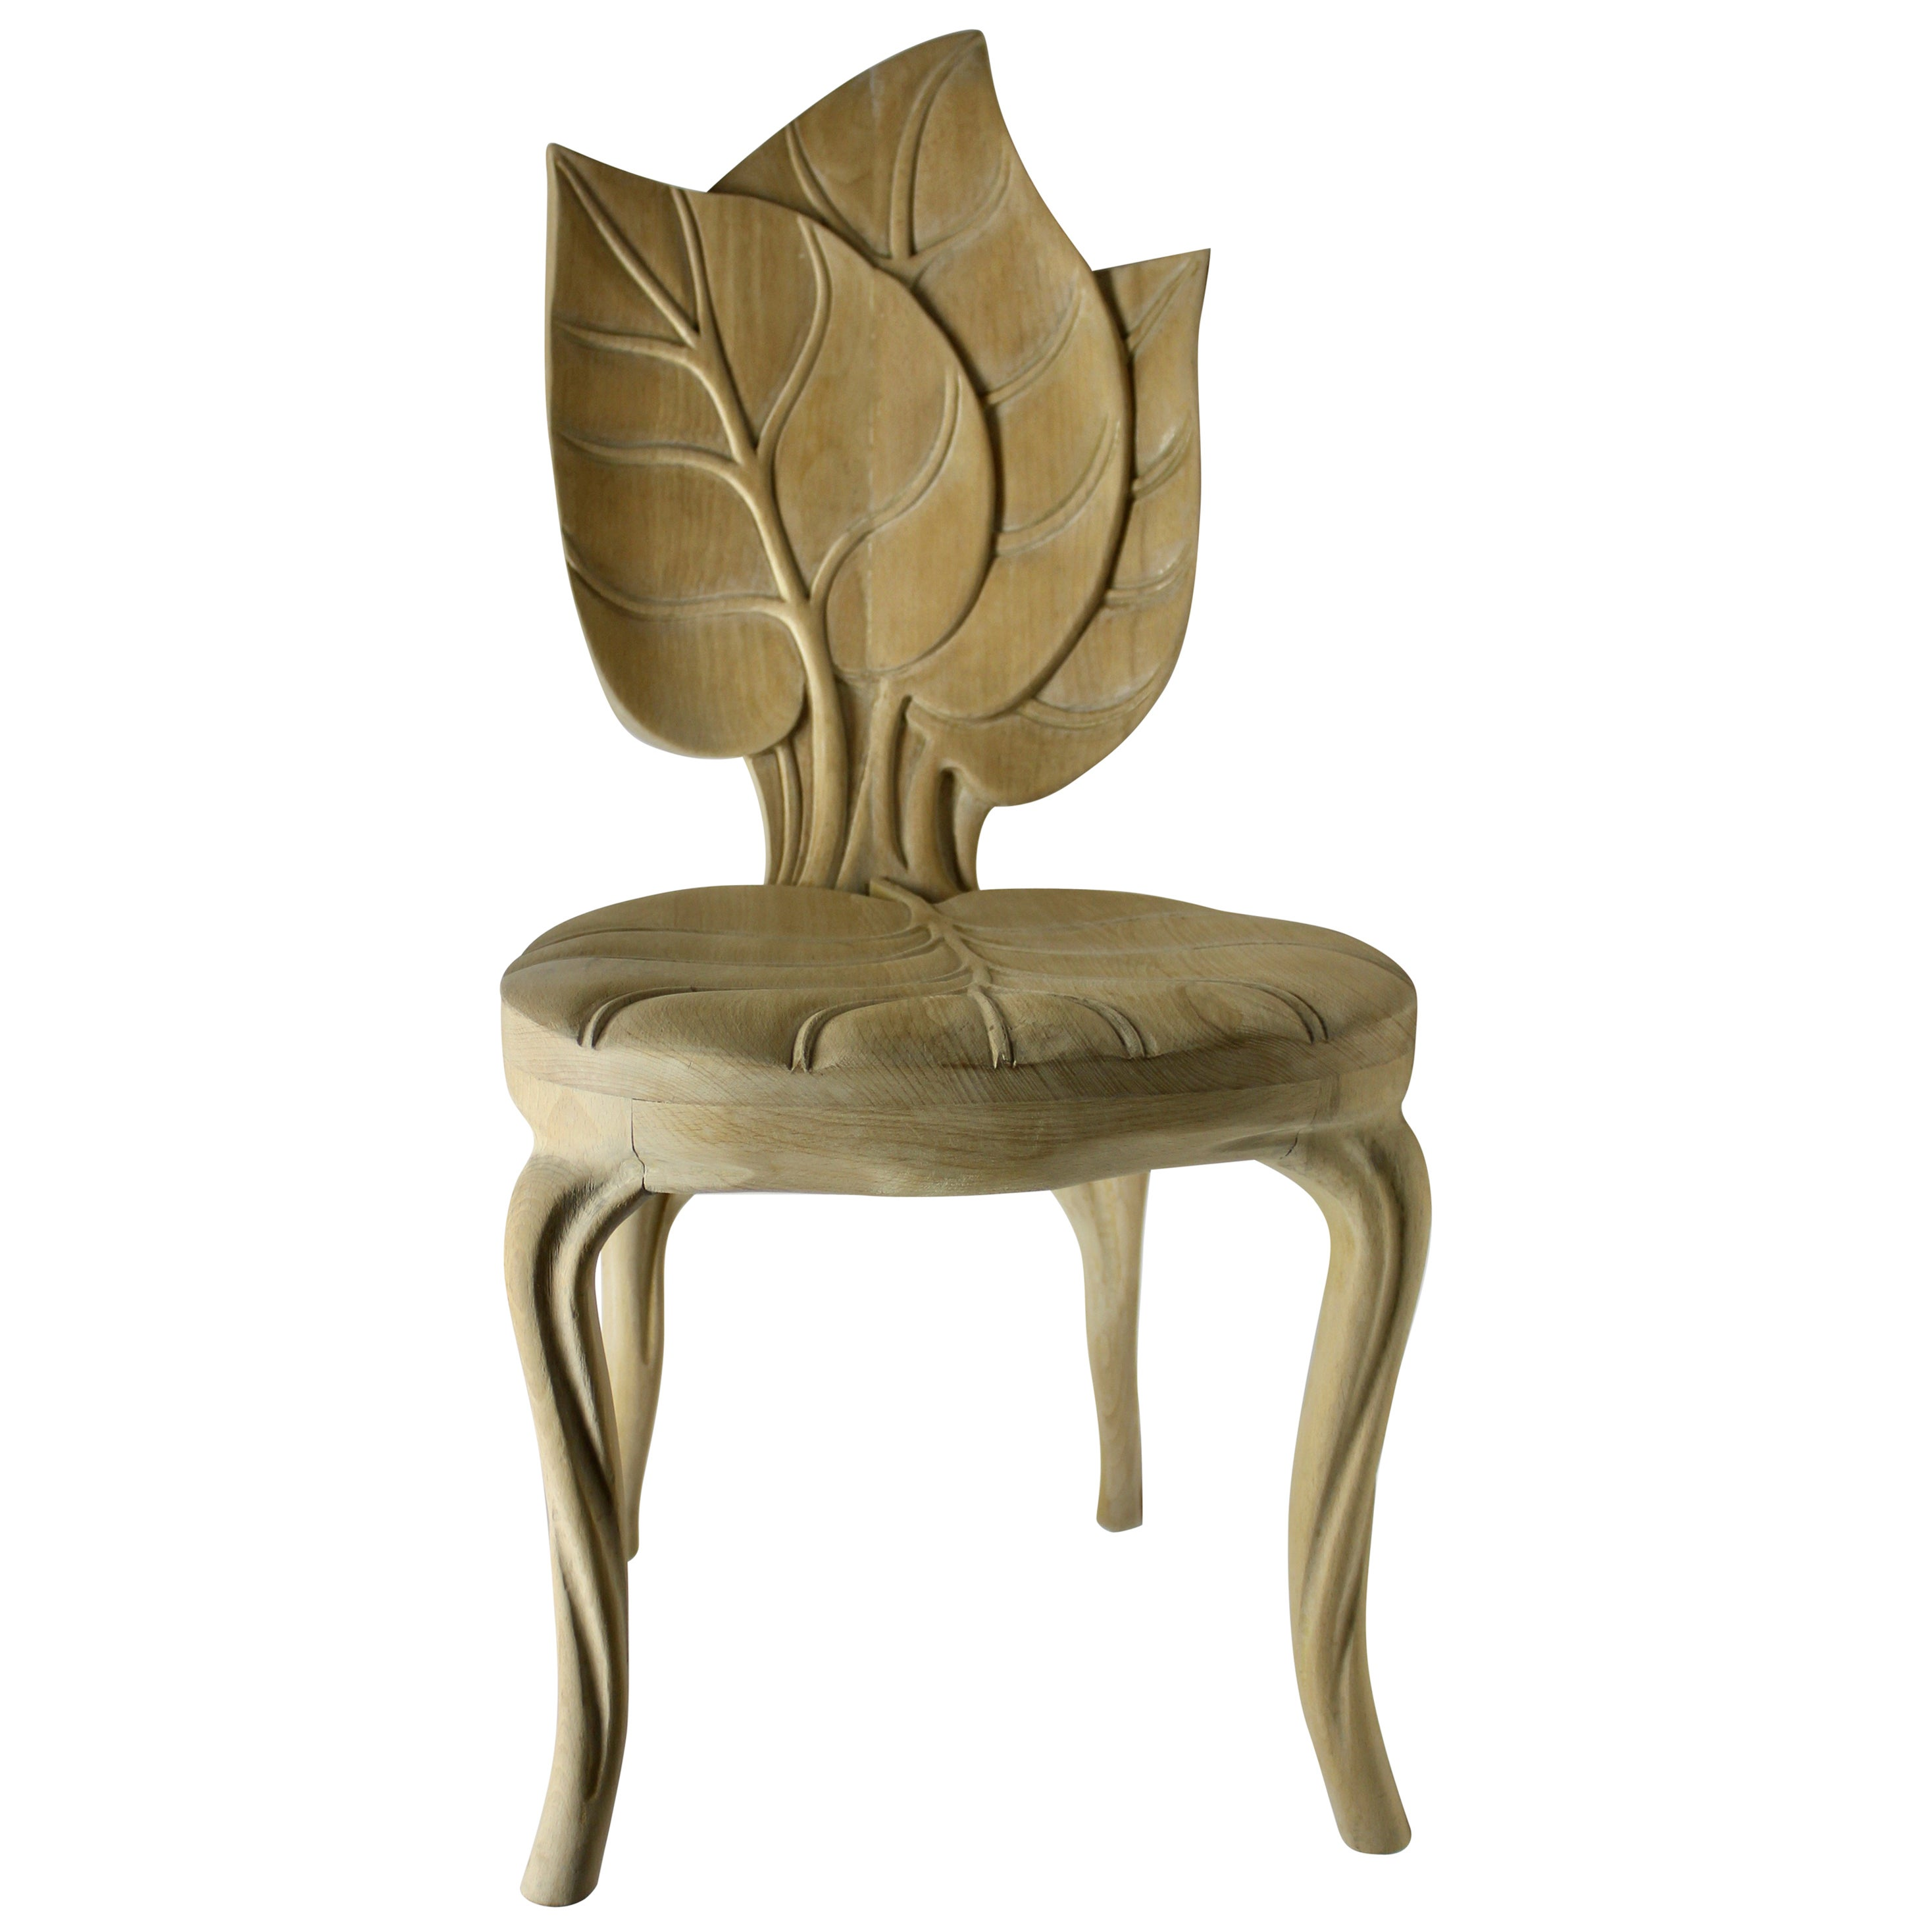 Organic Leaf Shape Wood Chair by Bartolozzi and Maioli